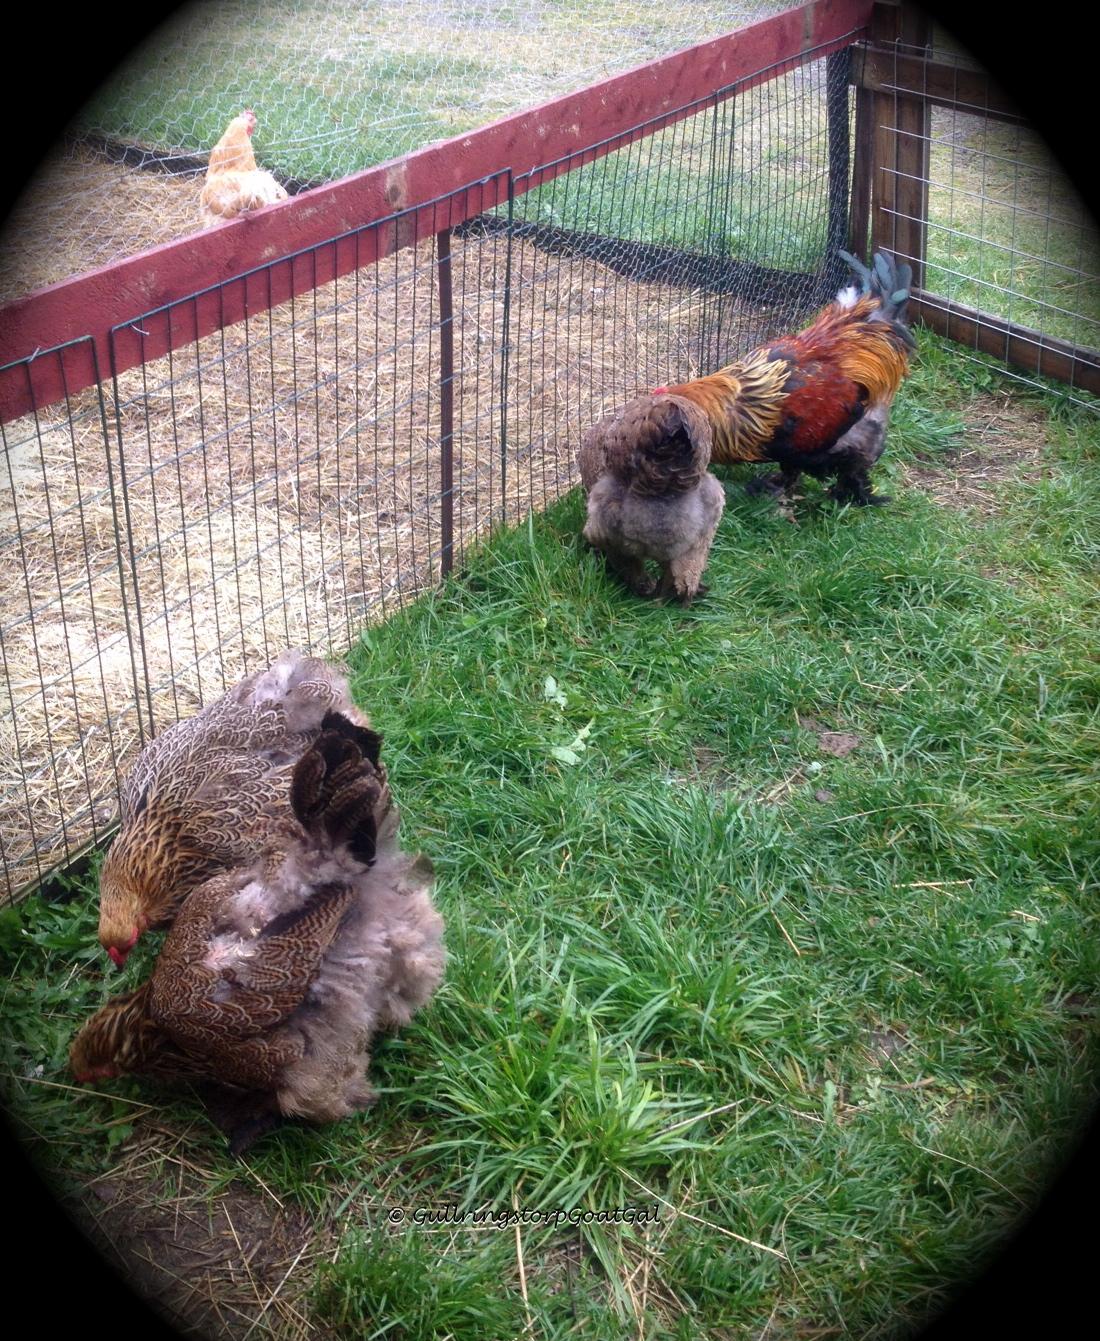 Sick Chicken No Feathers